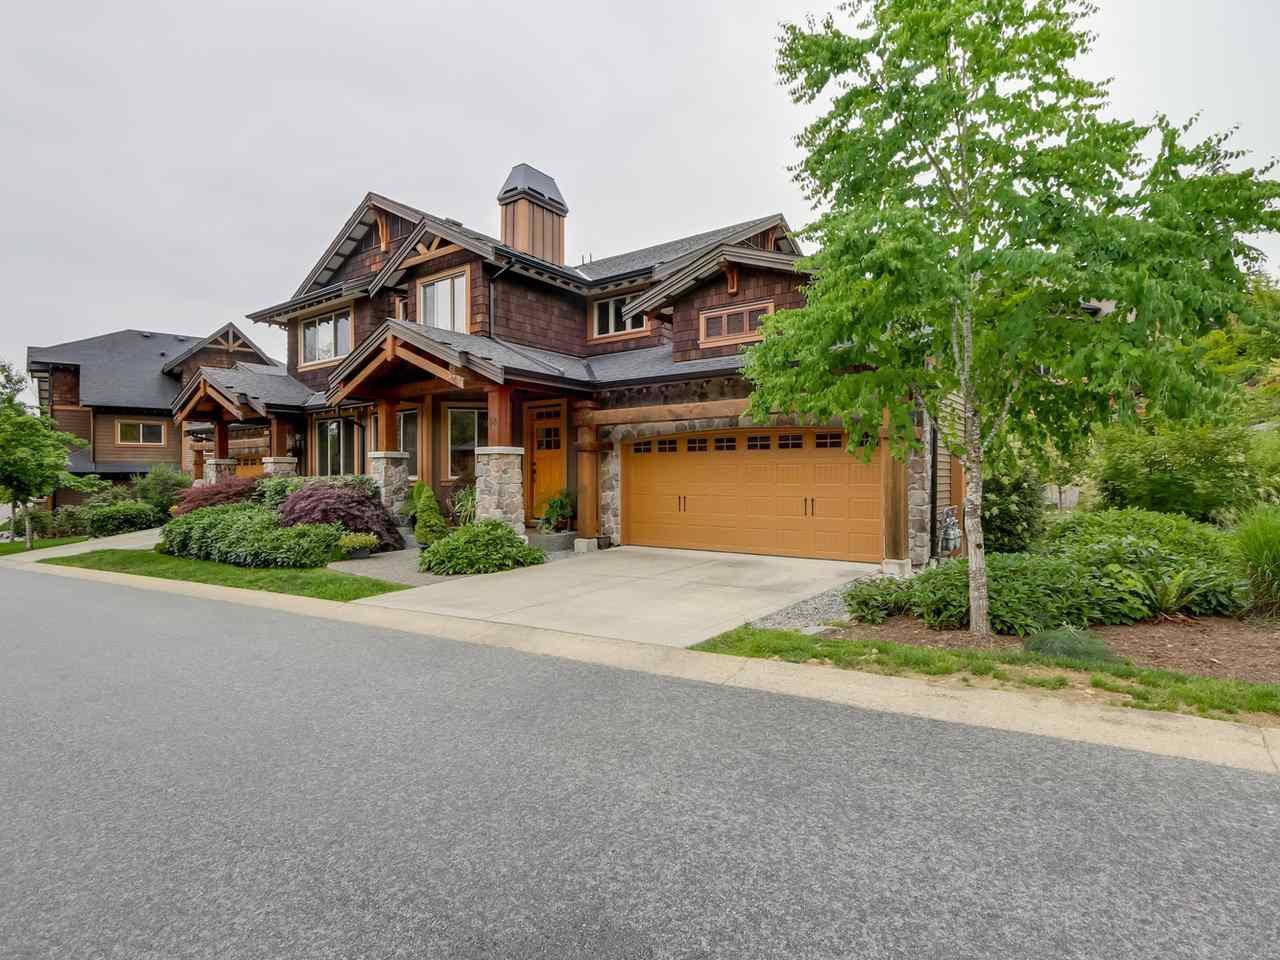 Main Photo: 56 24185 106B AVENUE in Maple Ridge: Albion Townhouse for sale : MLS®# R2080075